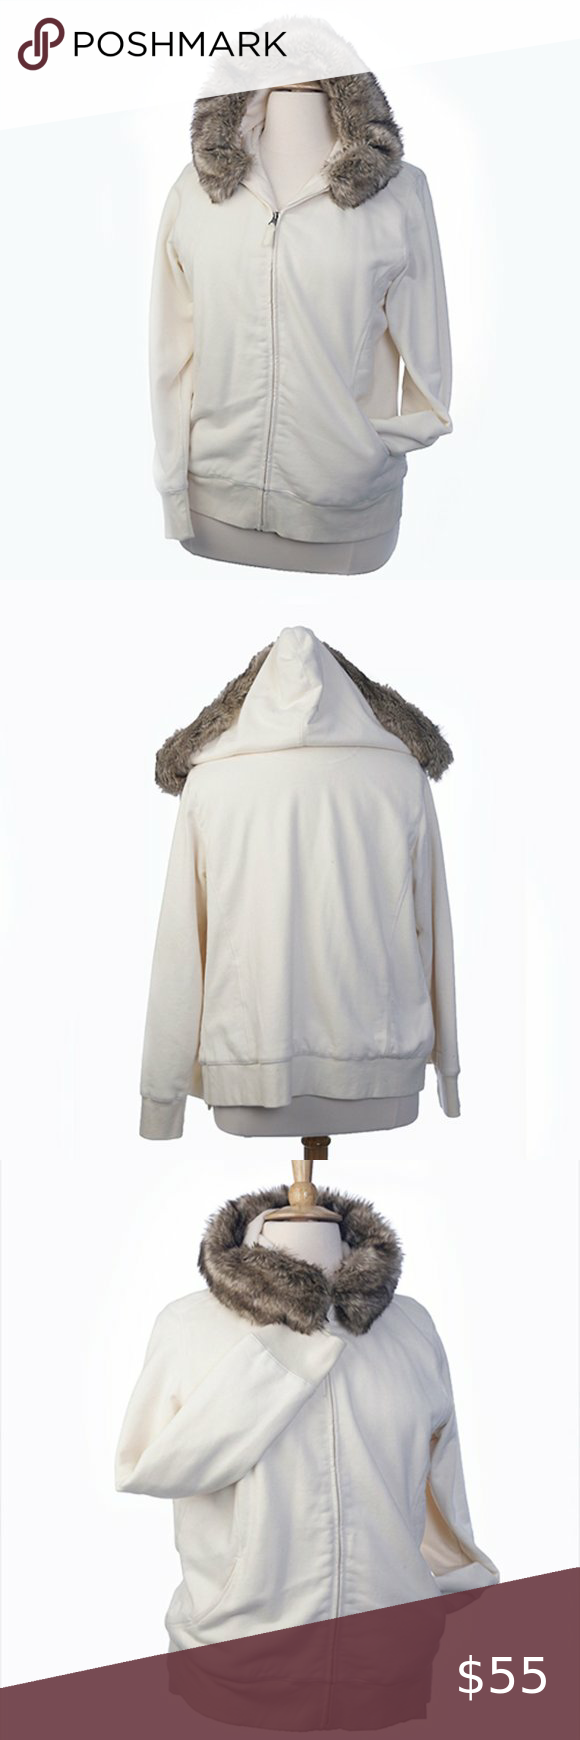 Ll Bean Zip Up Sweatshirt Jacket Outerwear Hood Xl White Winter Jacket Sweatshirt Jacket Outerwear Jackets [ 1740 x 580 Pixel ]